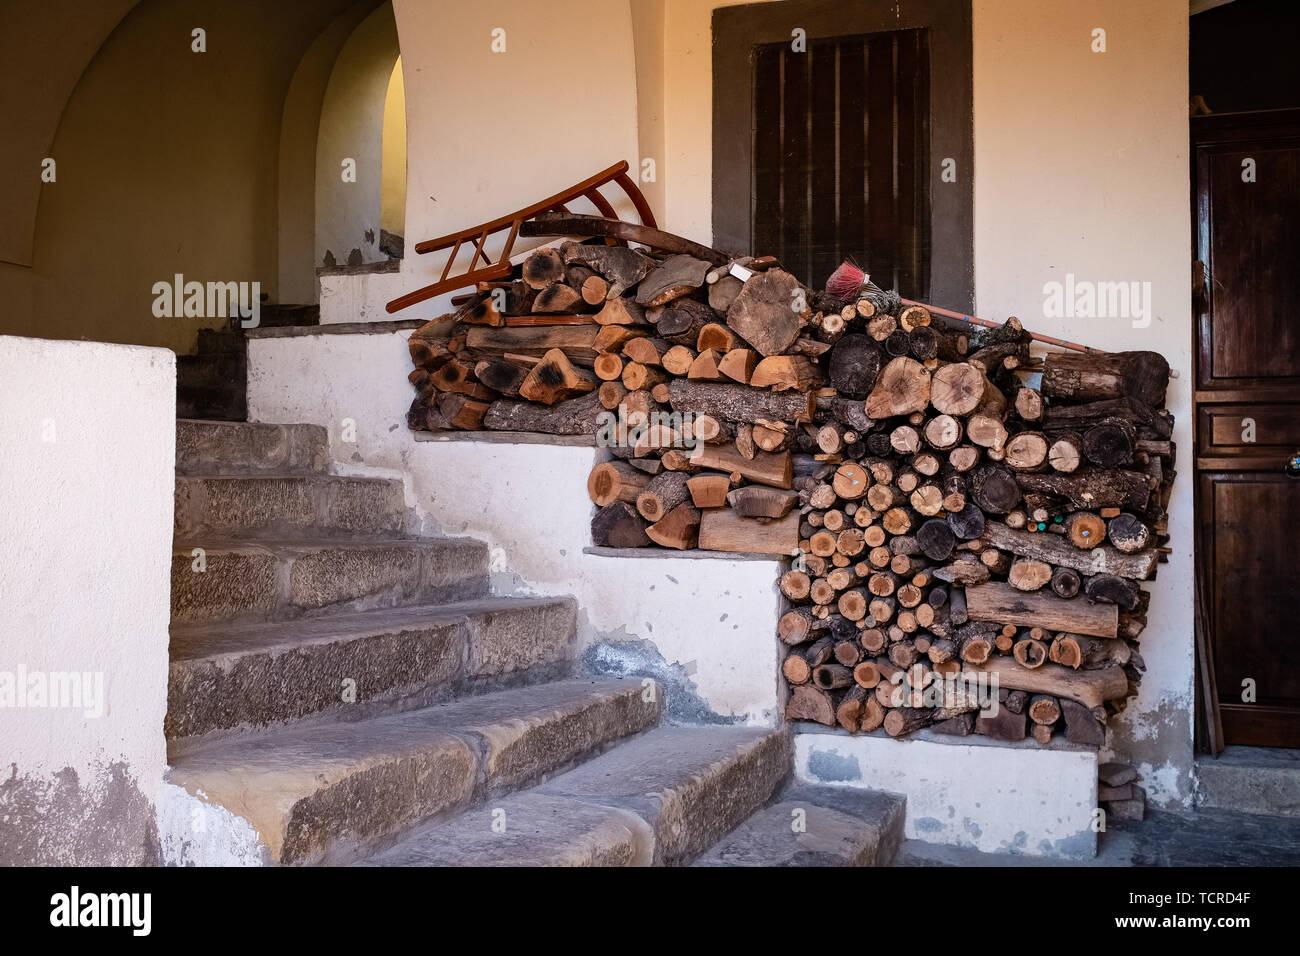 Wood pile. Ancient village of Castelmezzano. Basilicata region, Italy Stock Photo